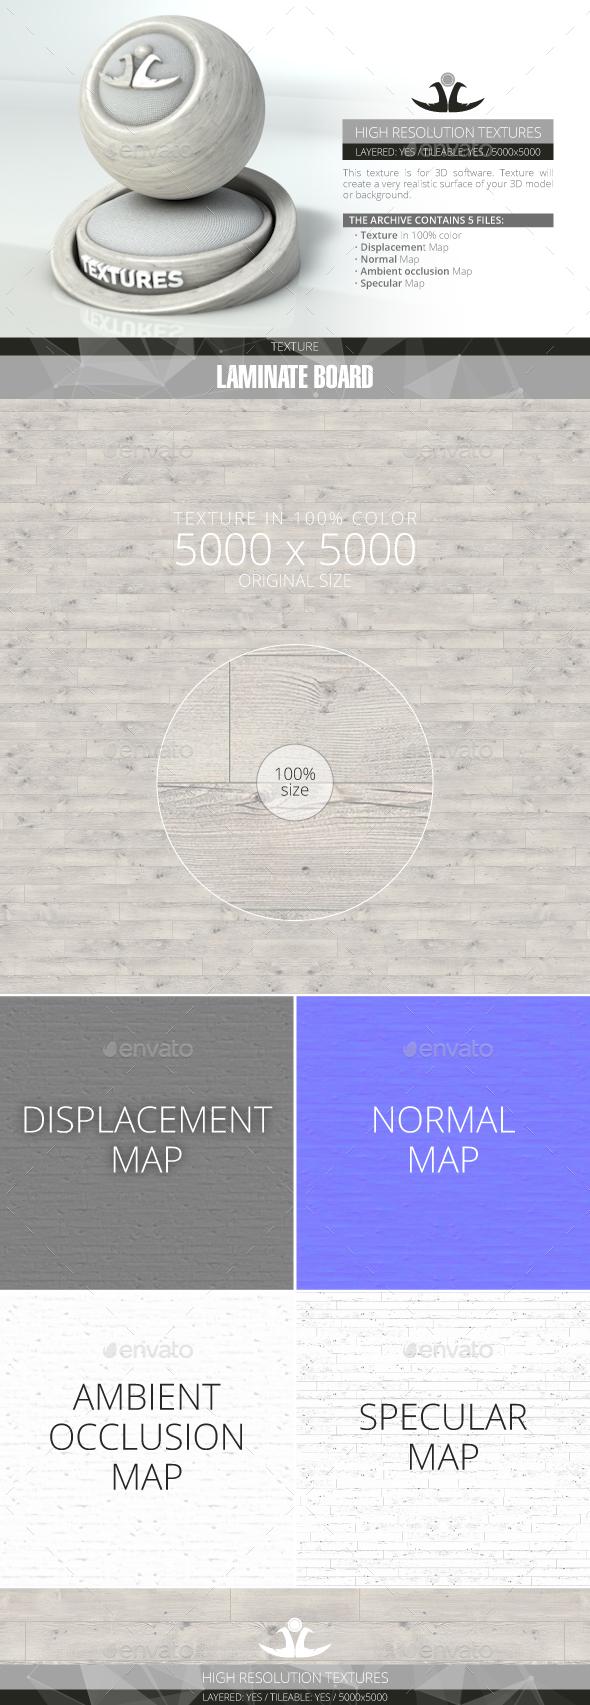 Laminate Board 62 - 3DOcean Item for Sale